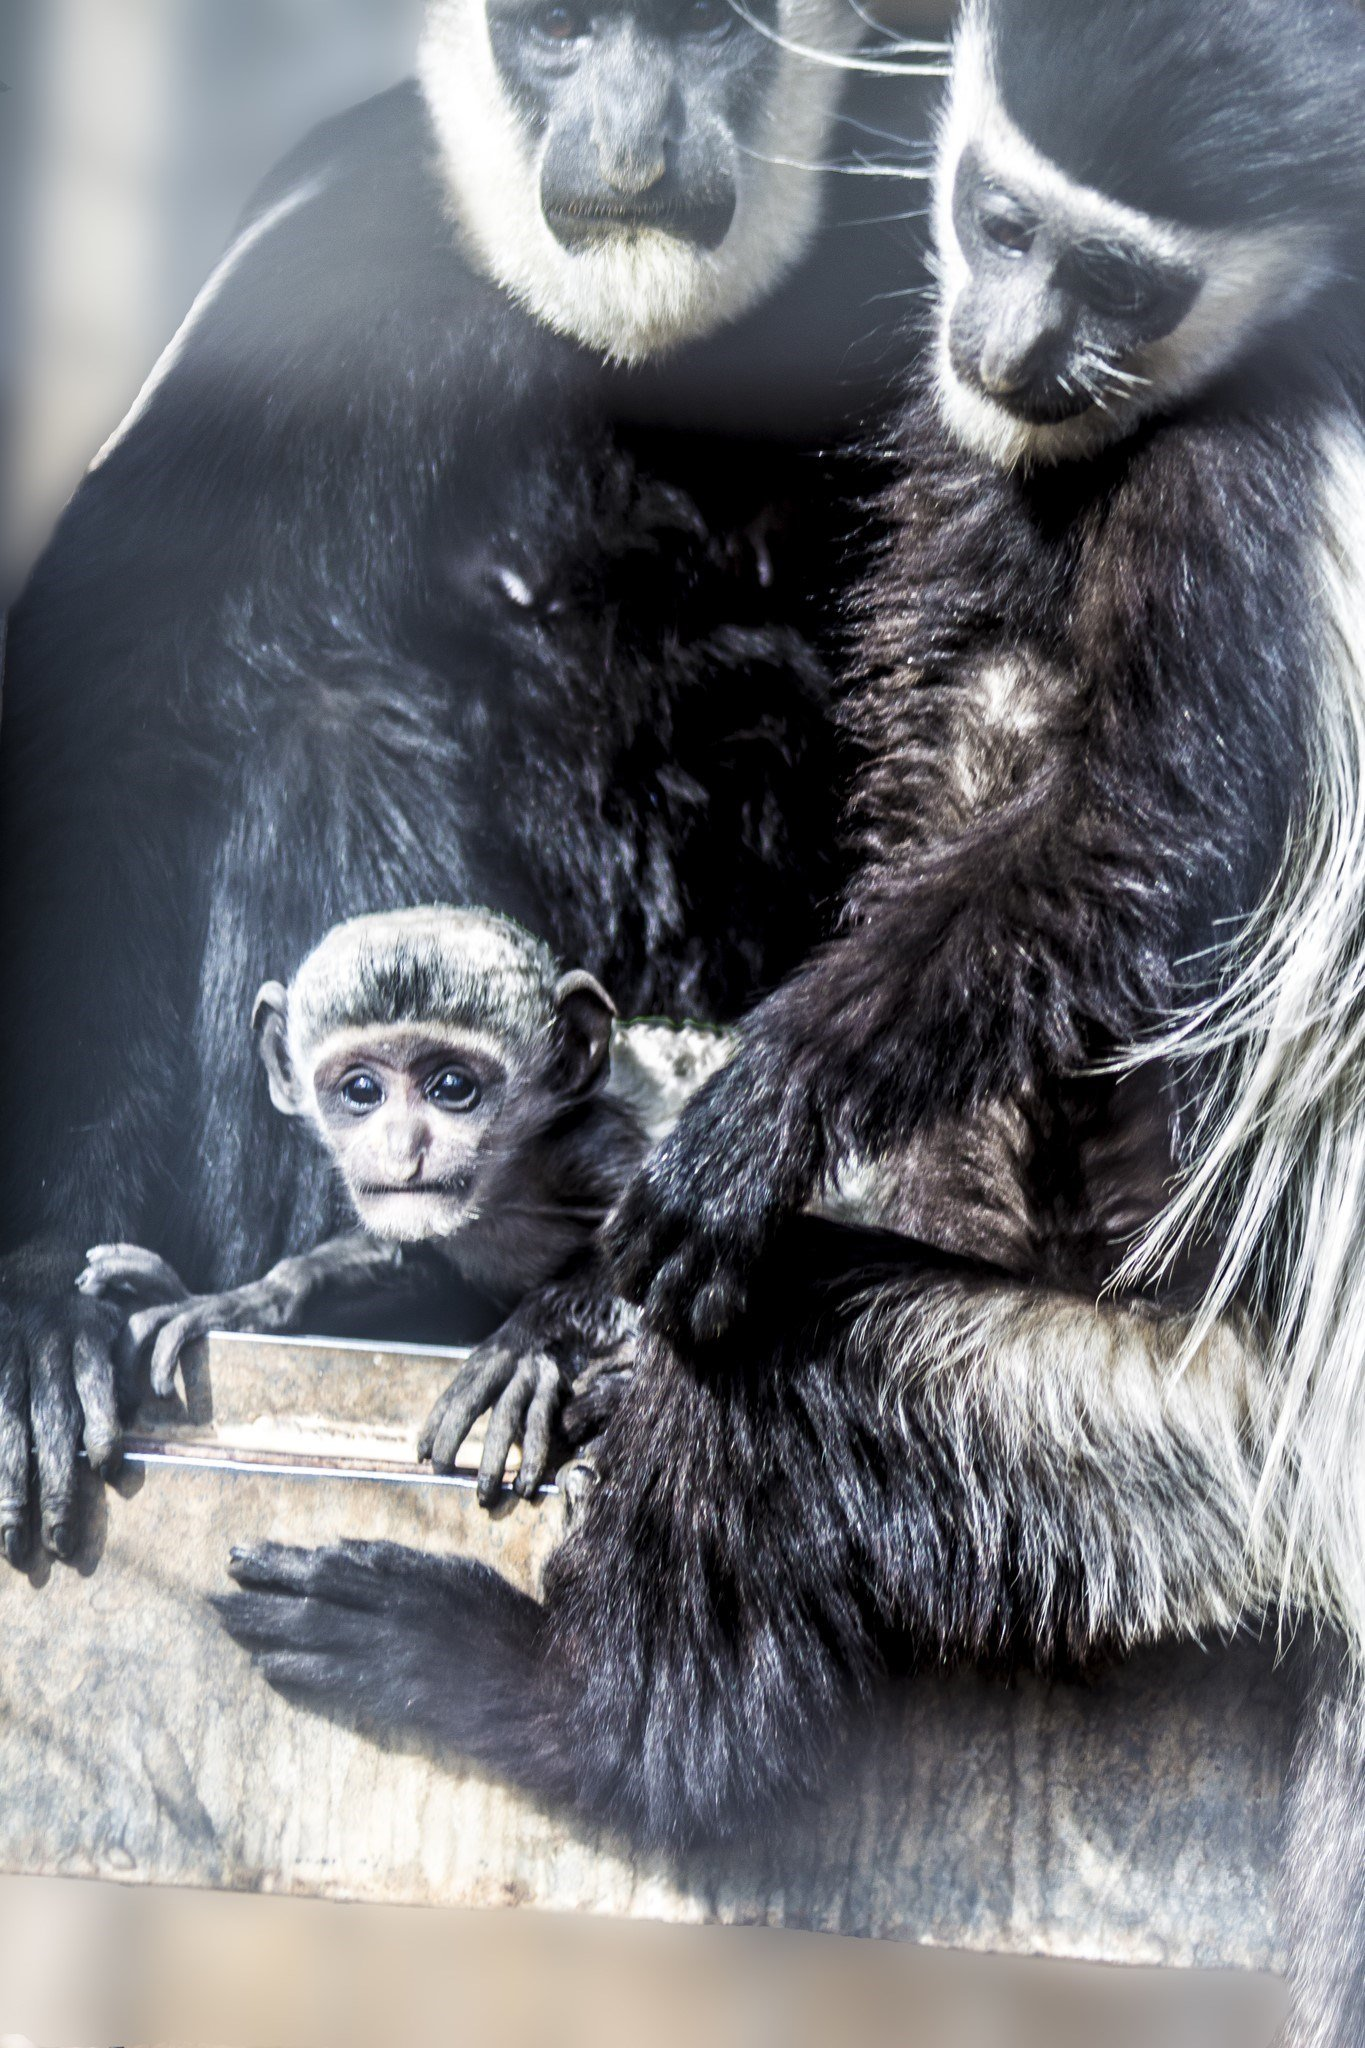 The Colobus monkey born at the Wildlife World Zoo. (Source: Wildlife World Zoo